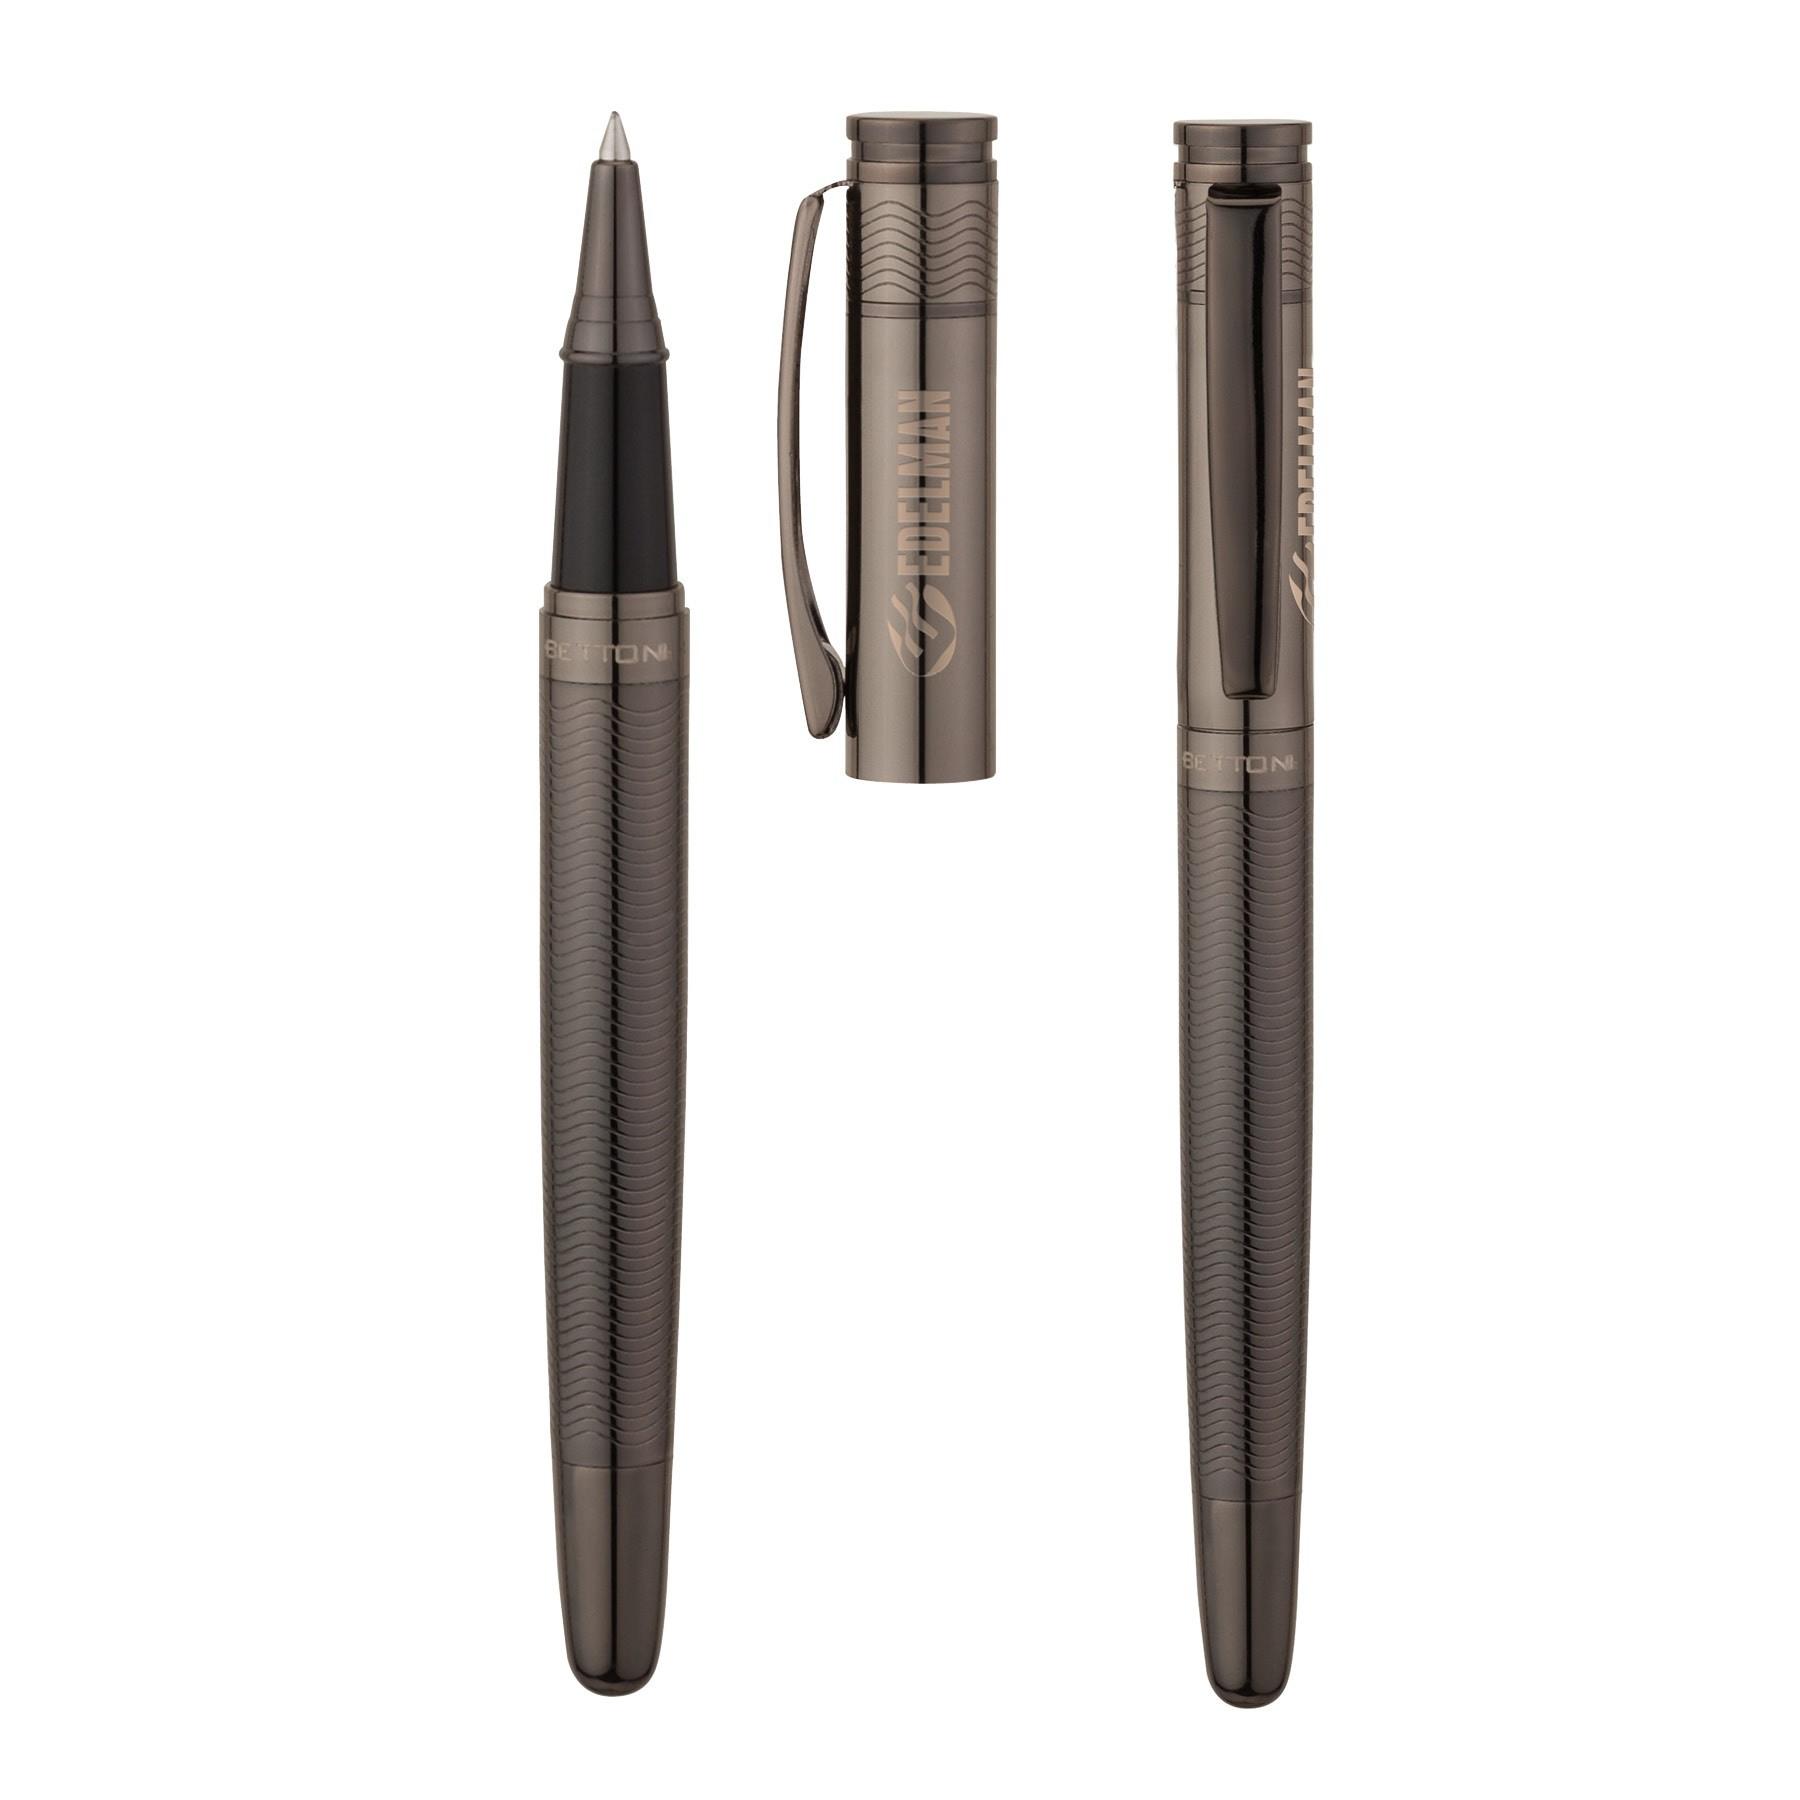 Bettoni® Abbracci Rollerball Pen